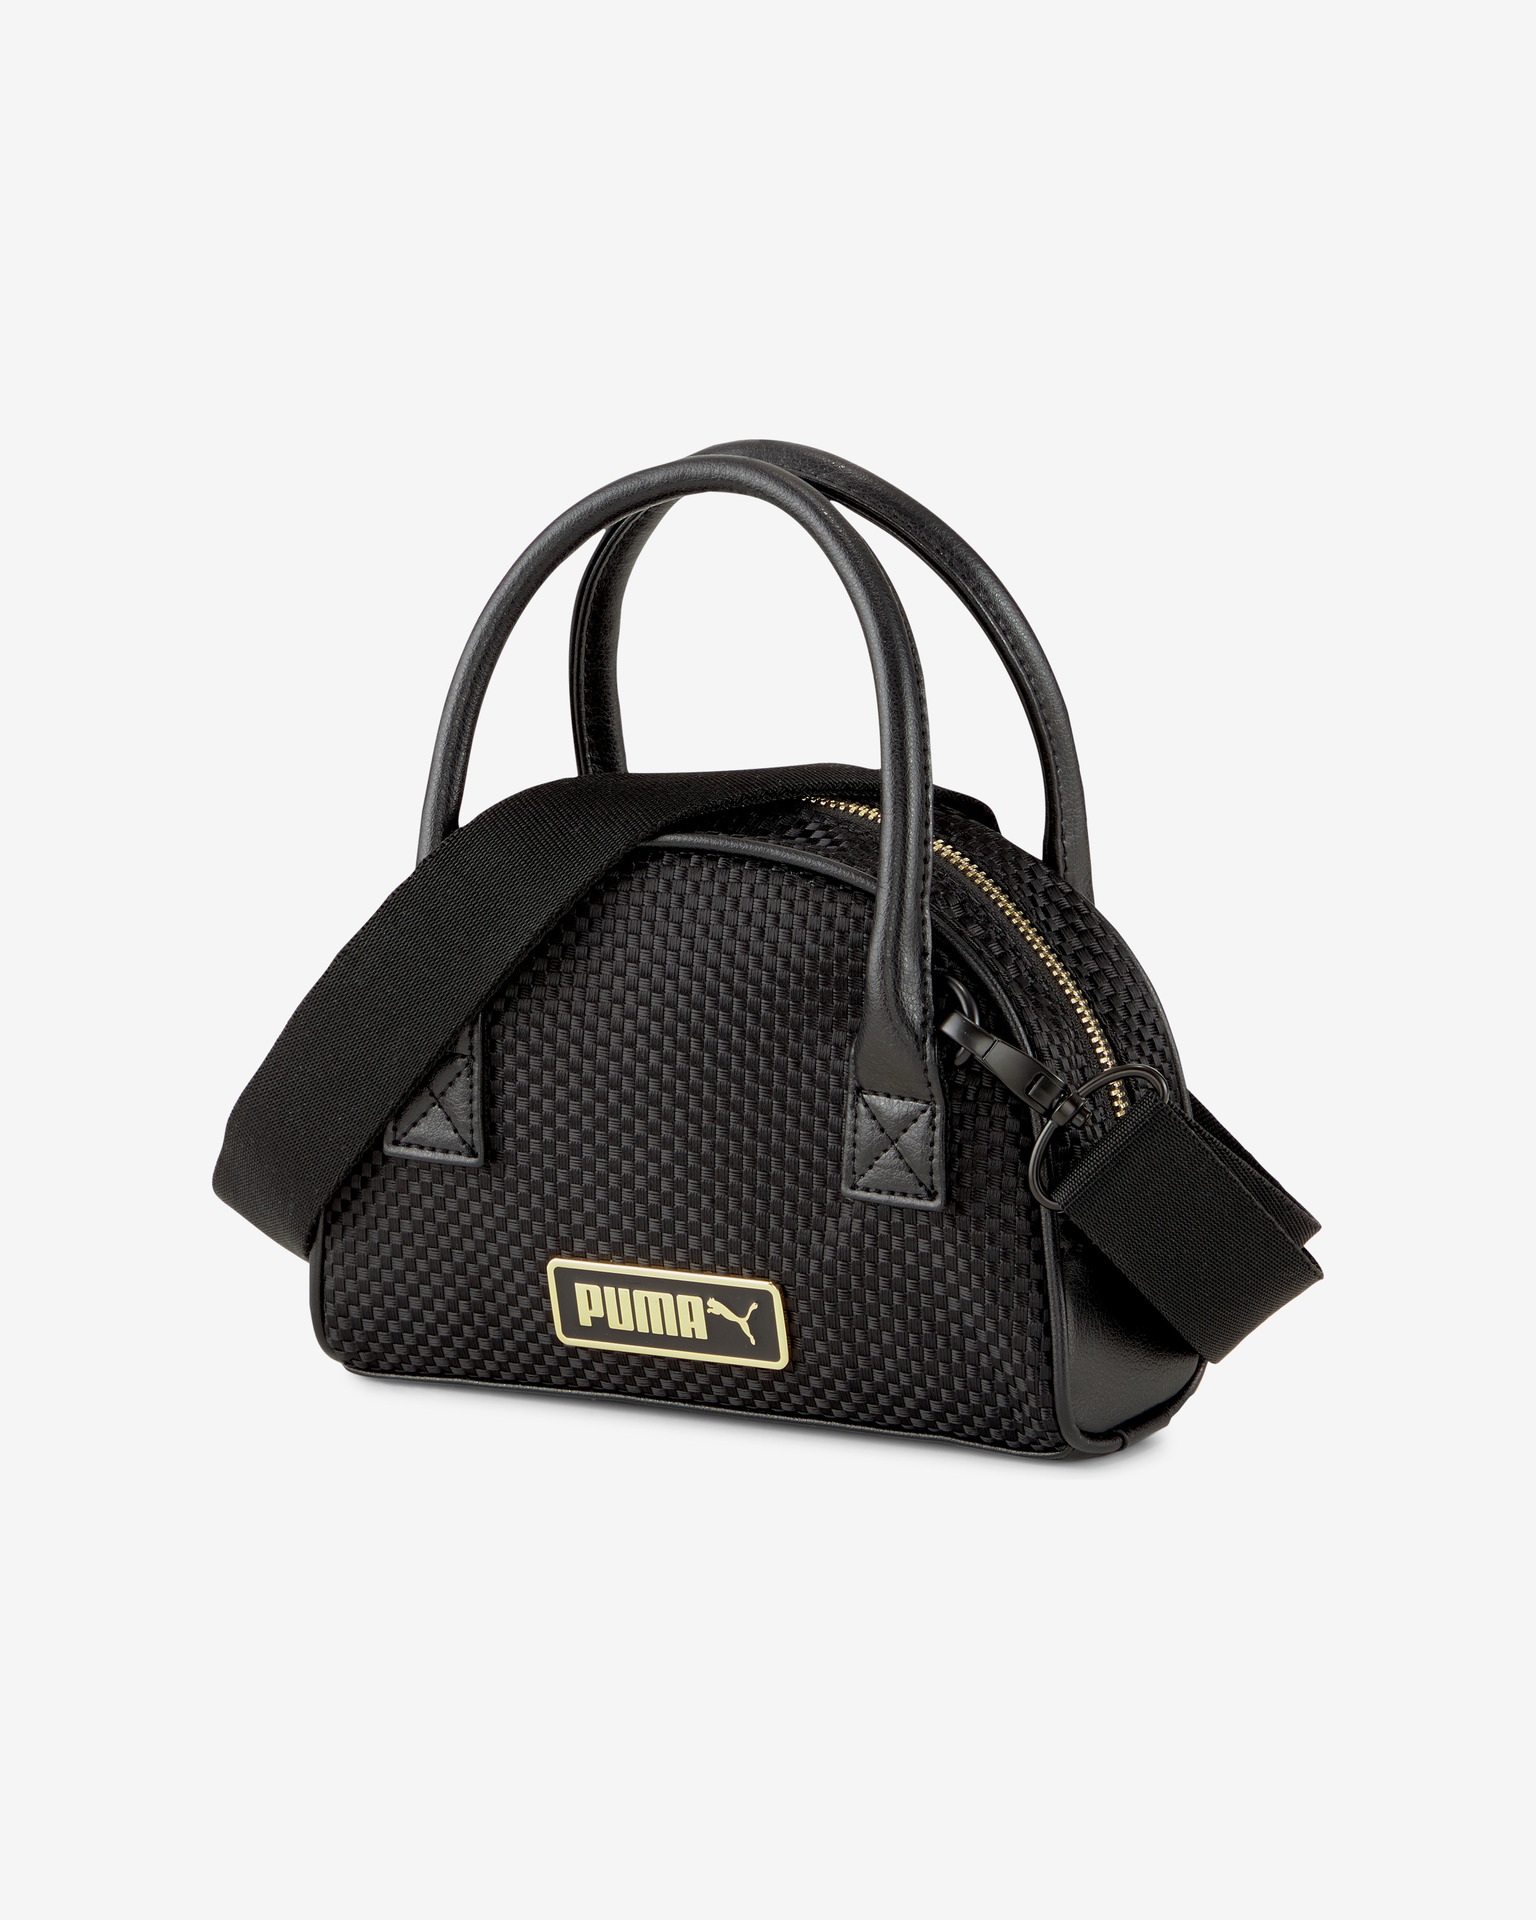 Puma Borsetta donna nero  Premium